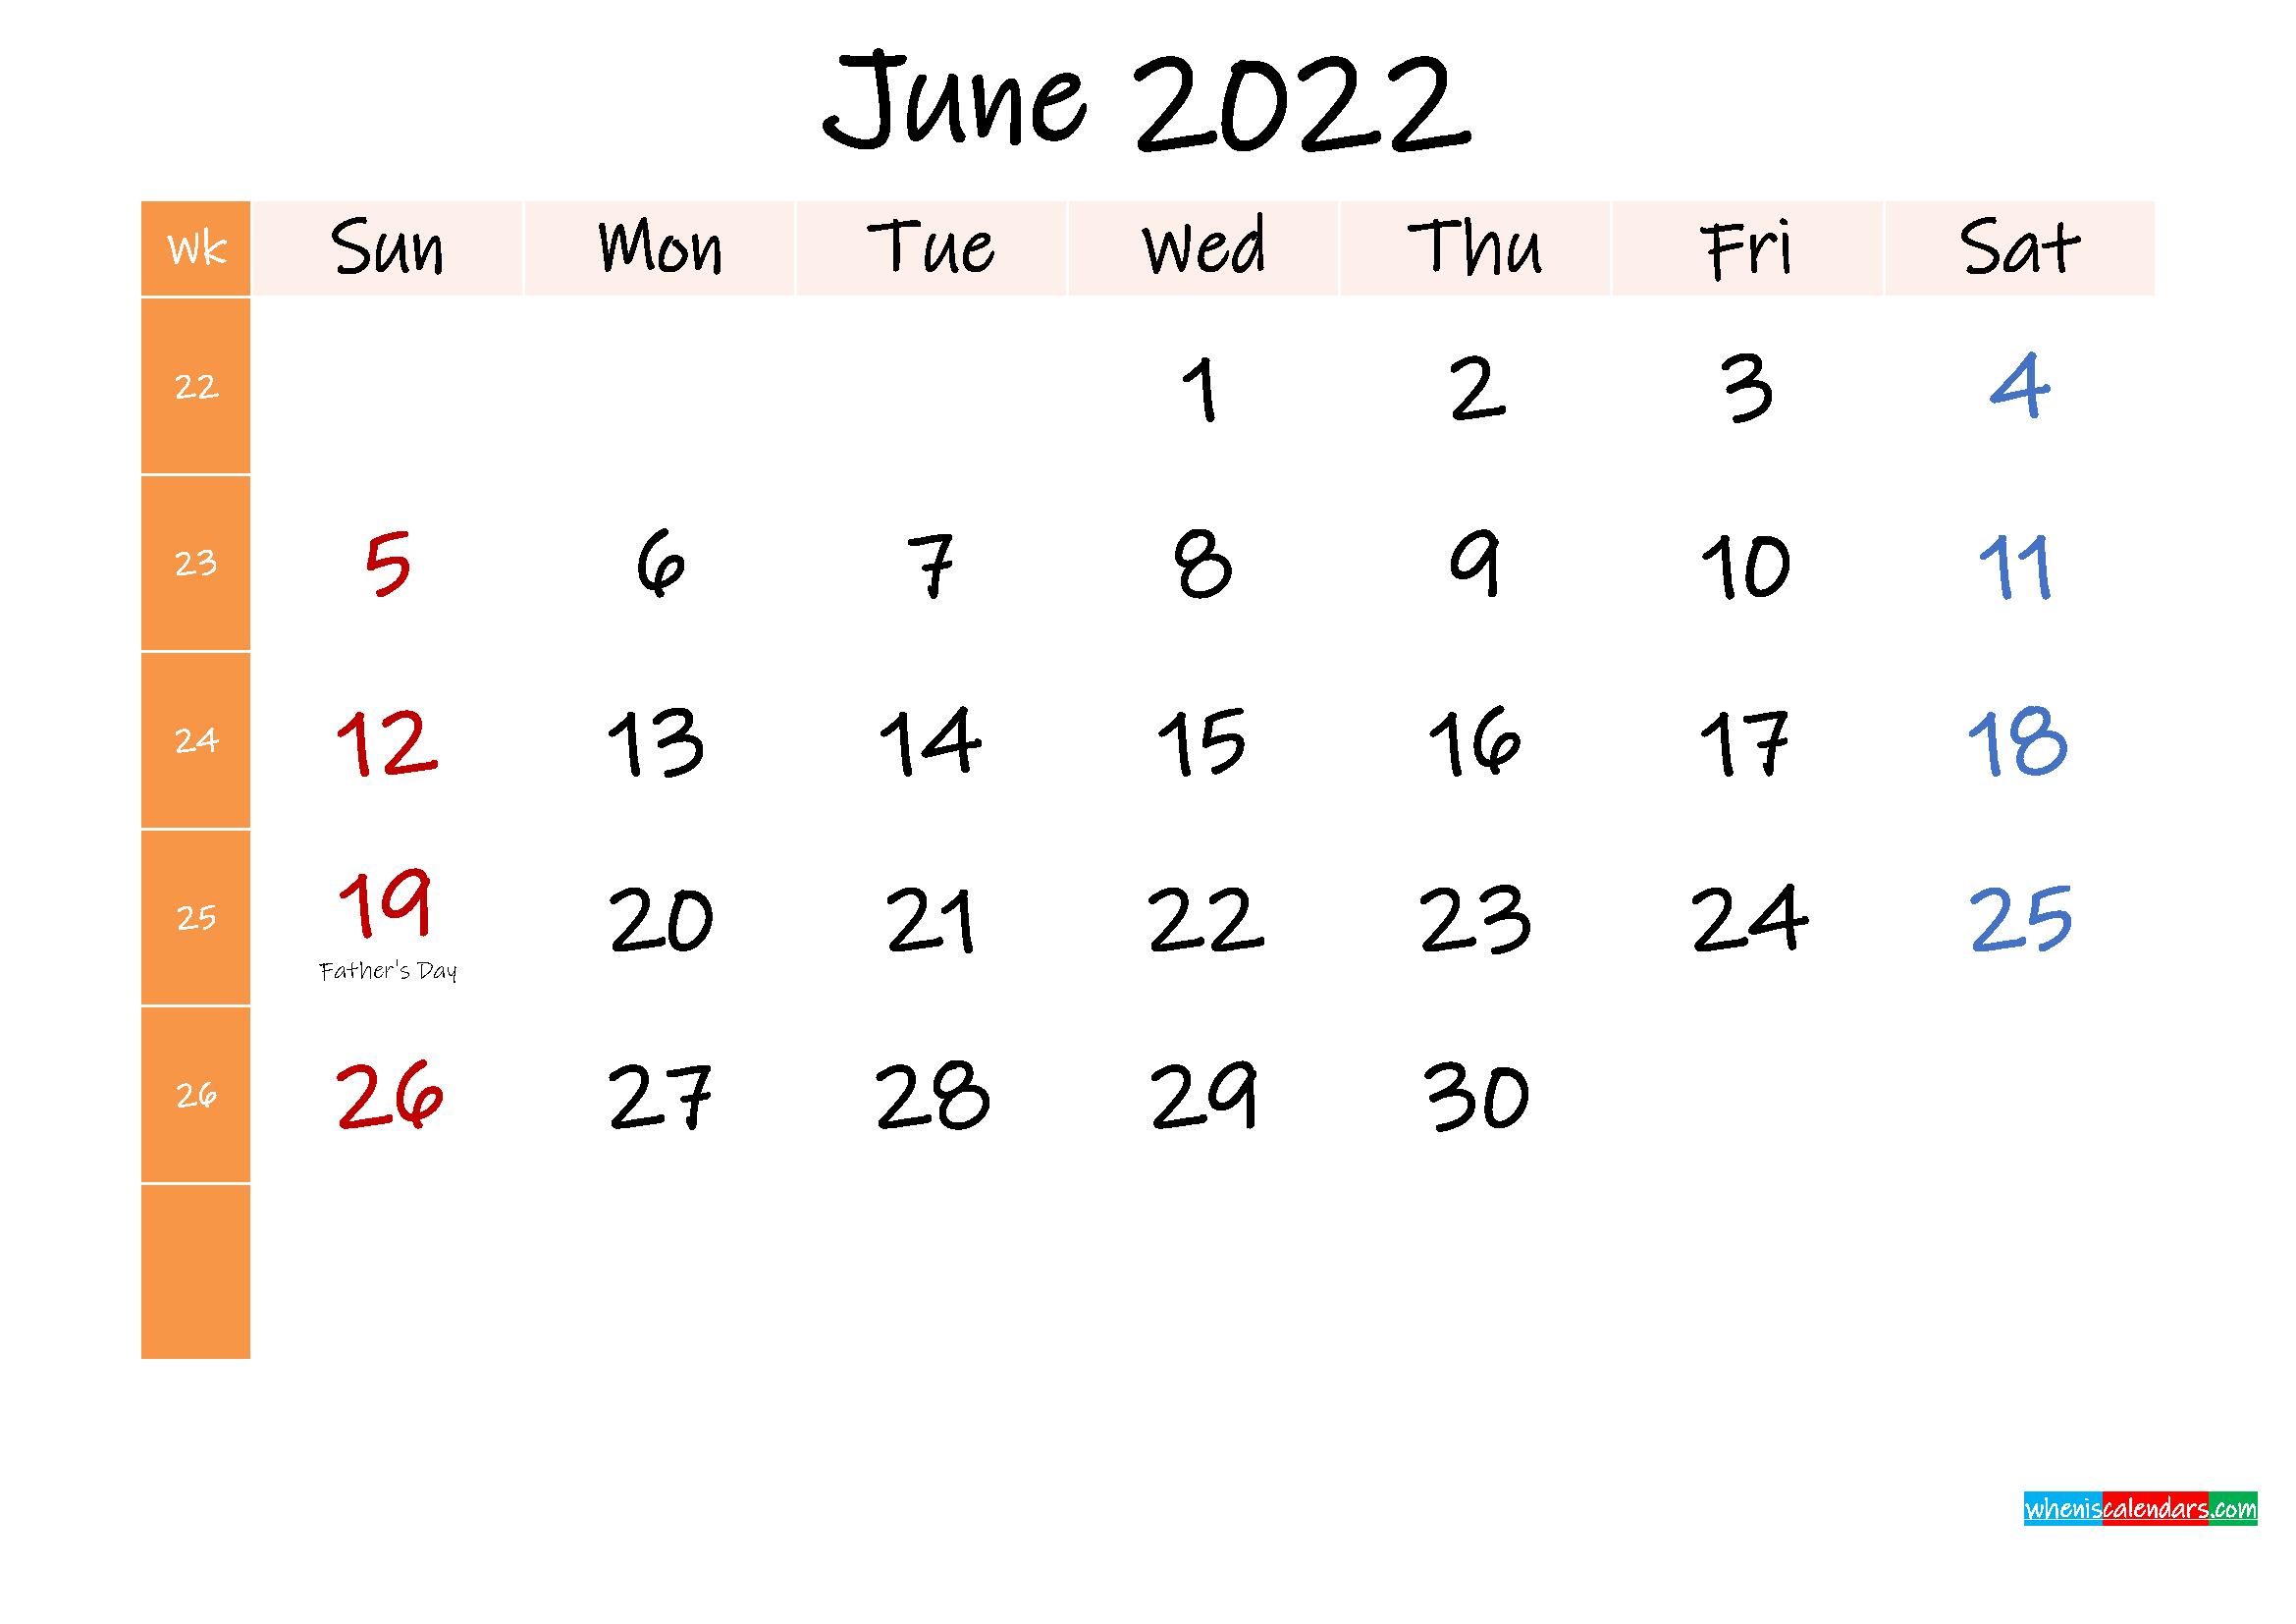 Free June 2022 Monthly Calendar Template Word